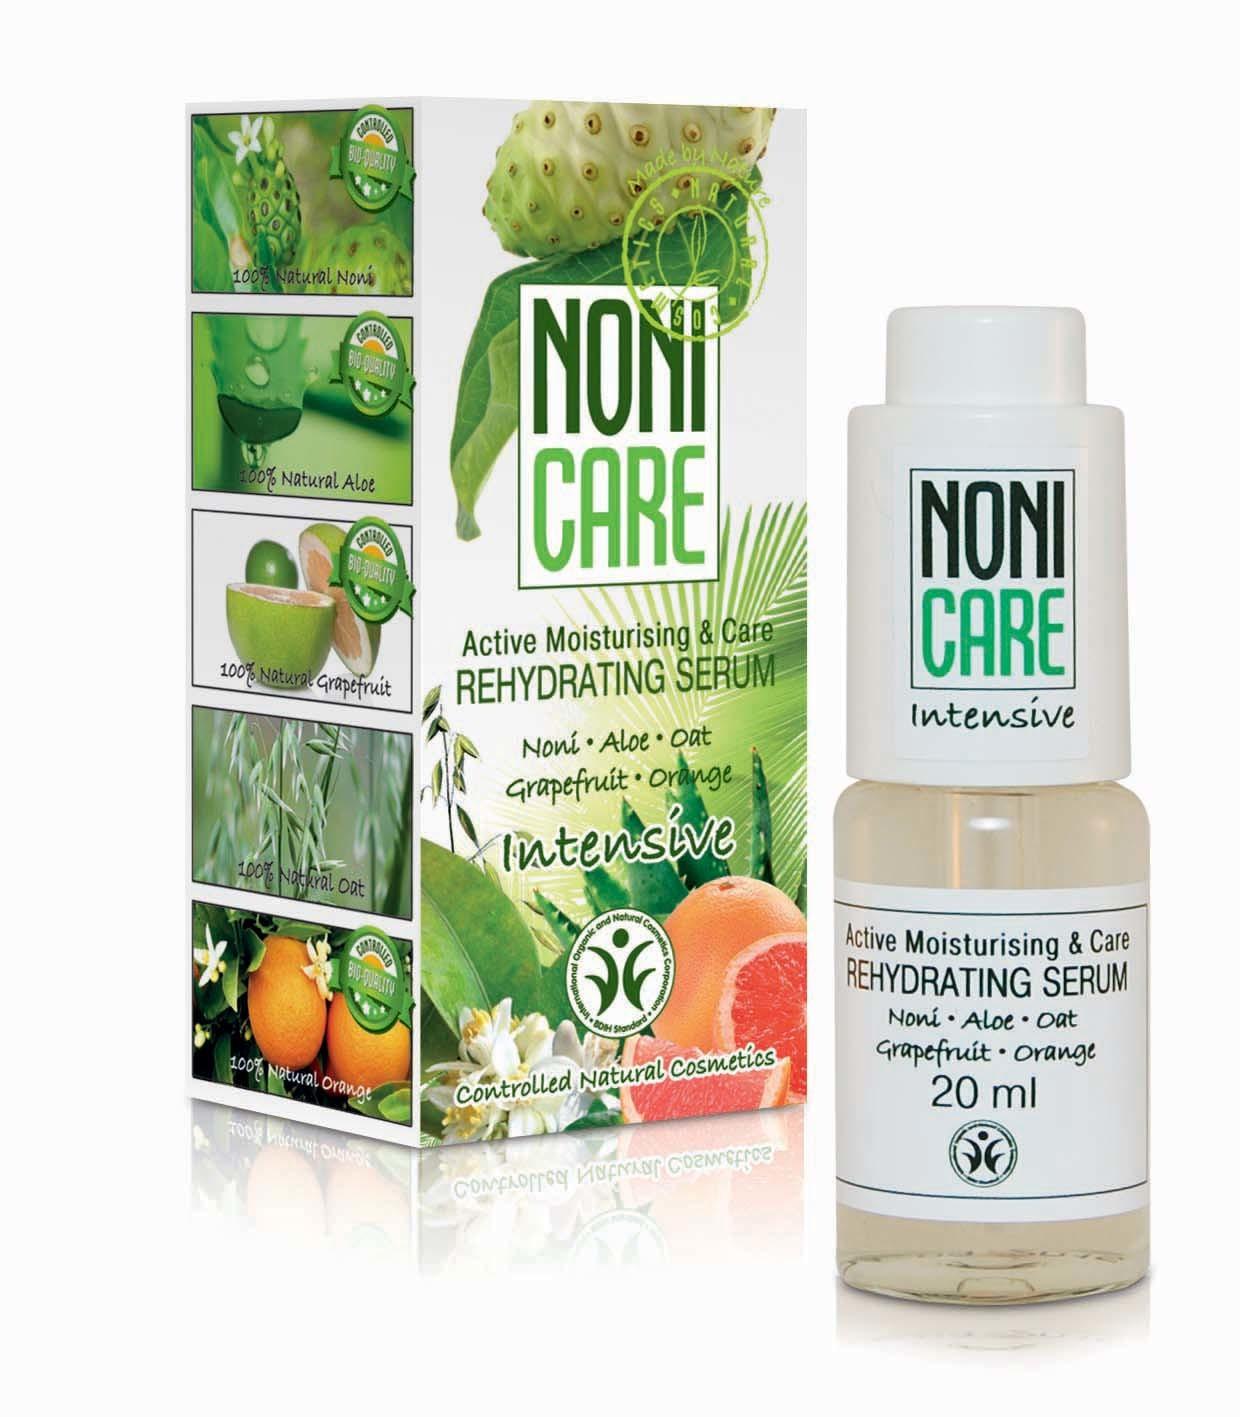 Увлажняющая сыворотка - Rehydrating Serum